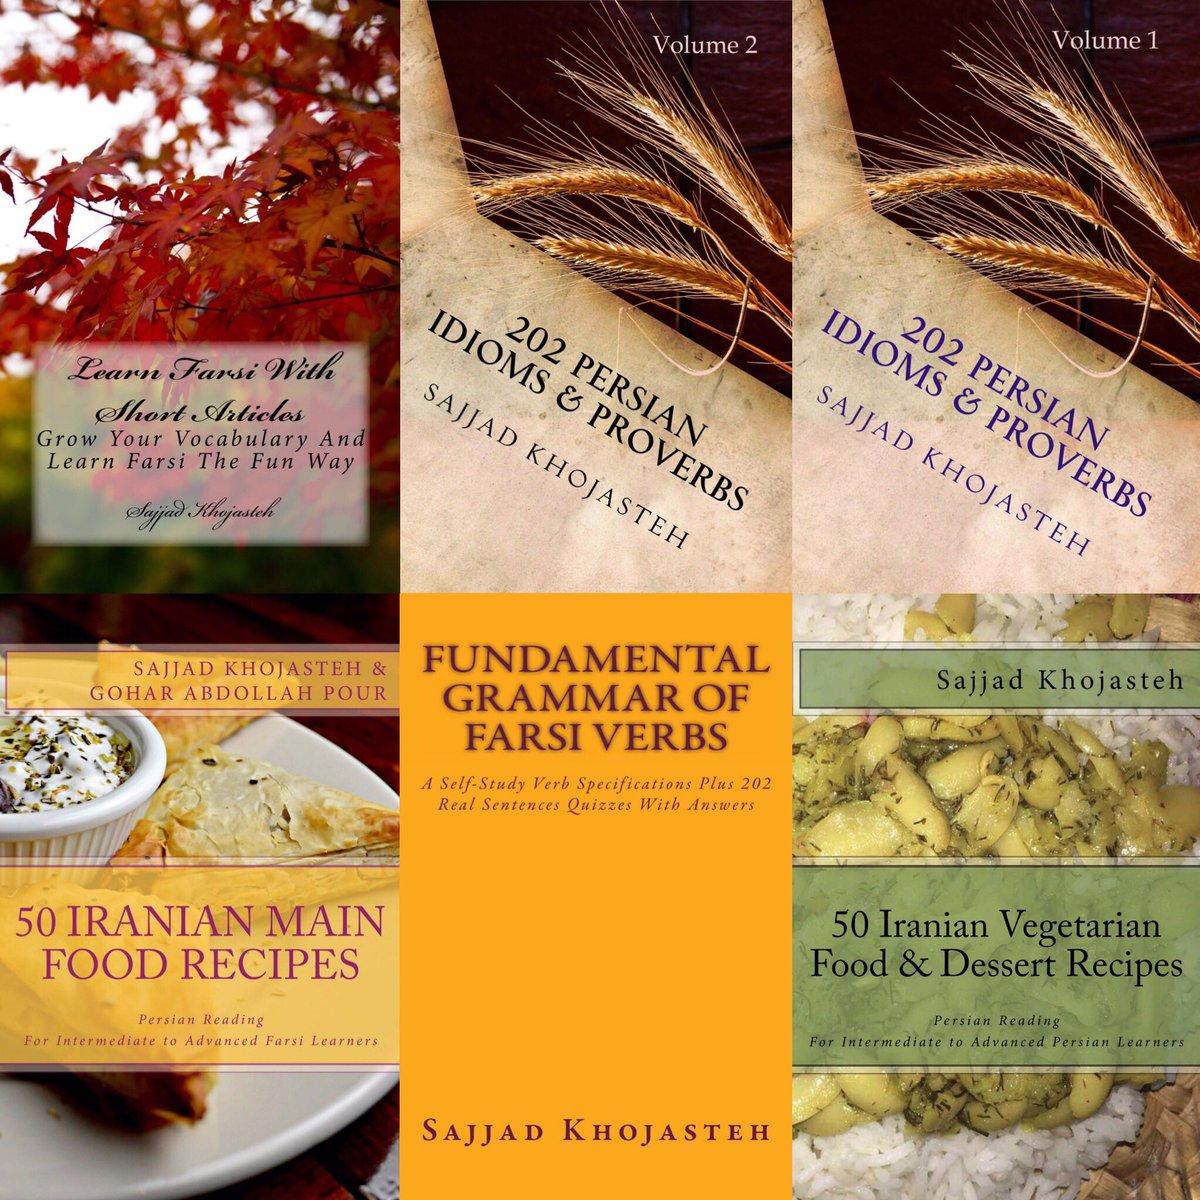 Our Farsi Books #Persian #Idioms #Proverbs #Iran #Short _Articles #Farsi #Grammar<br>http://pic.twitter.com/ihJ6Lpv19l